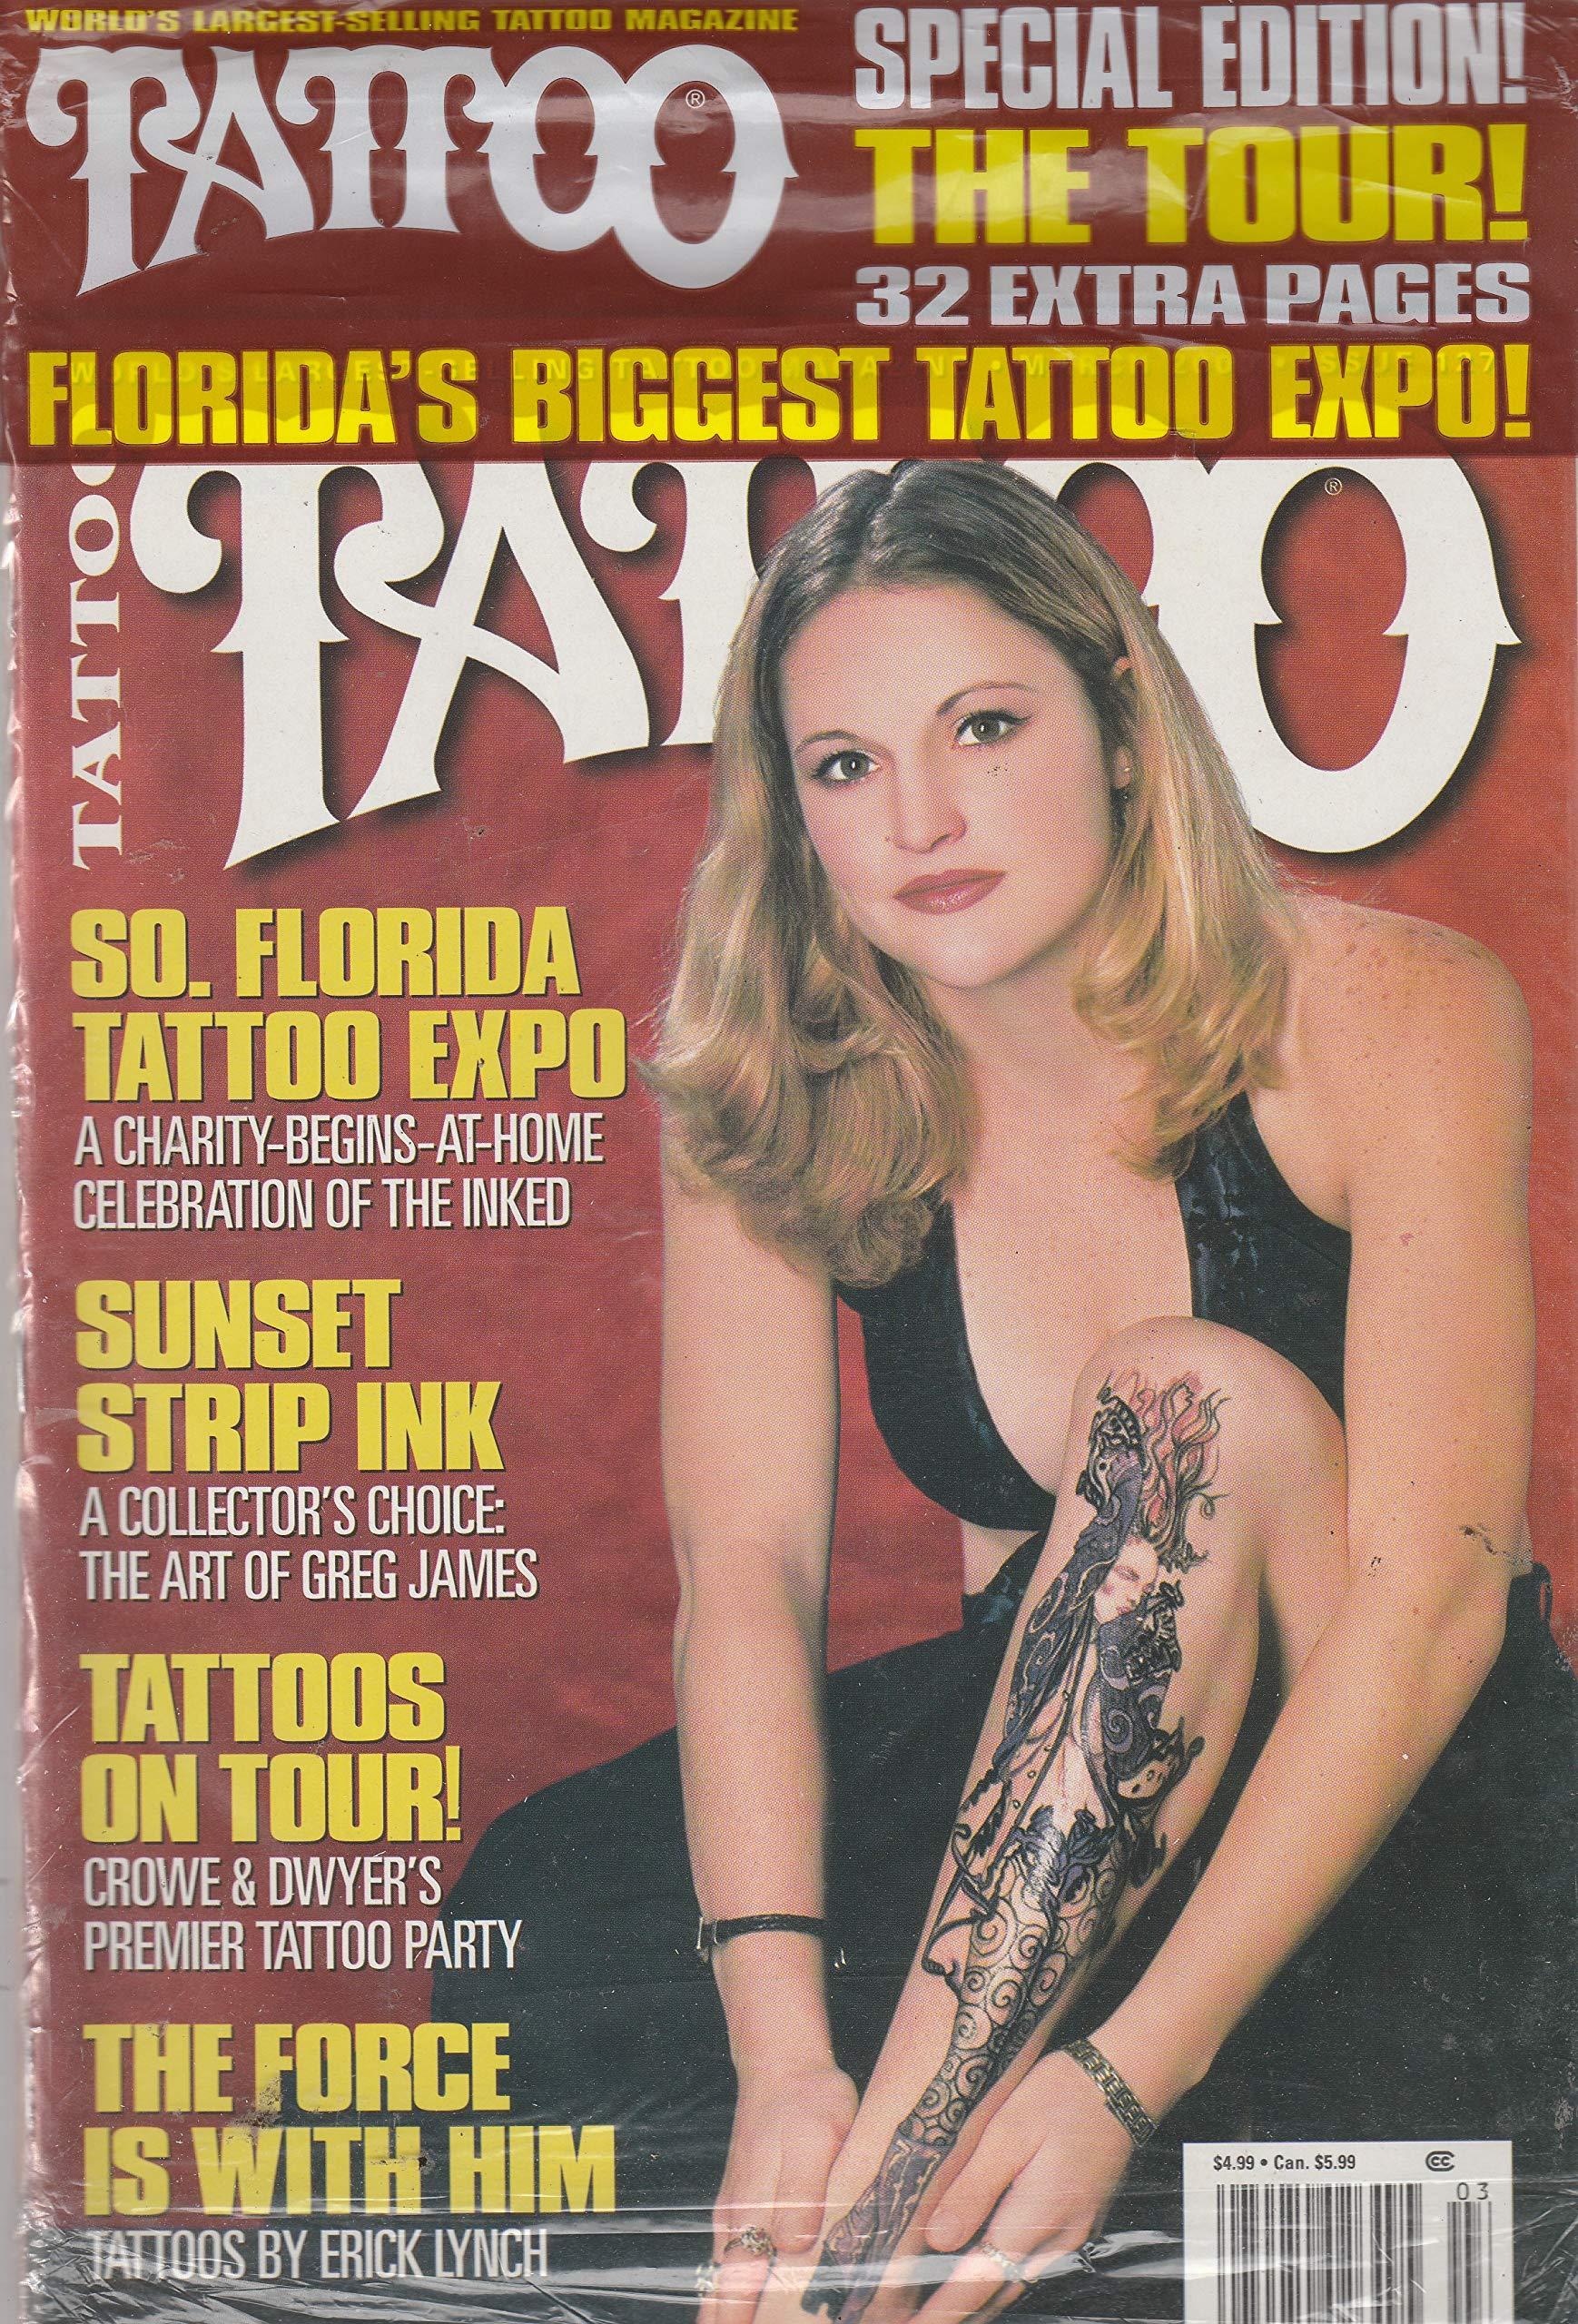 TATTOO Magazine March 2000 No. 127 (World\'s largest selling tattoo ...